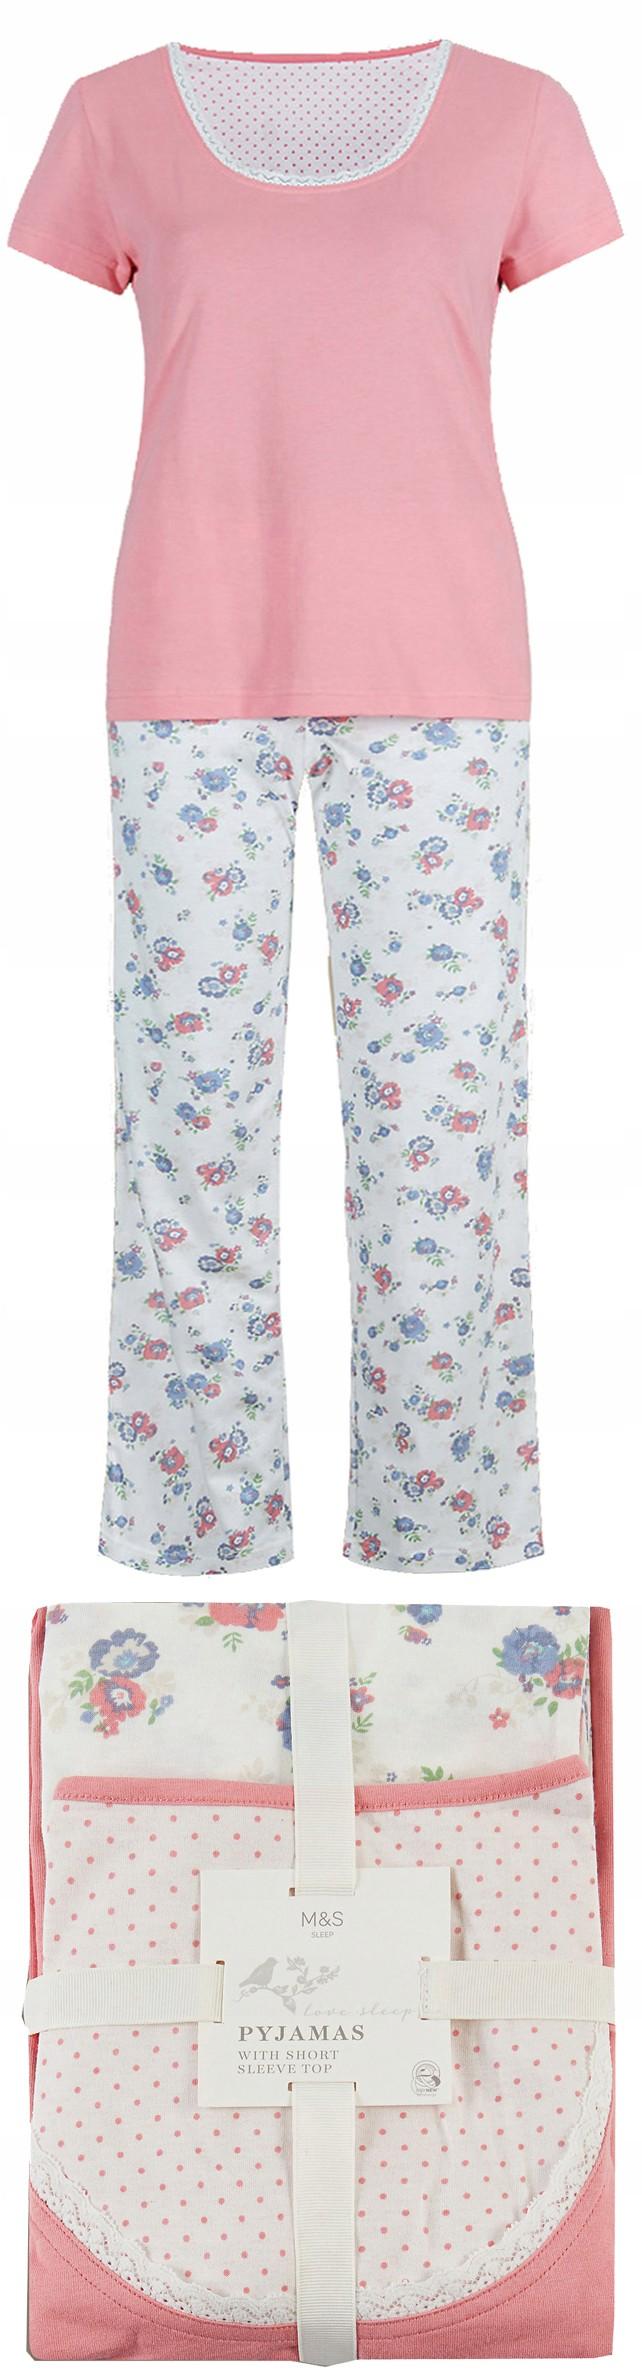 NOWY M&S angielska piżama komplet s/m 36/38